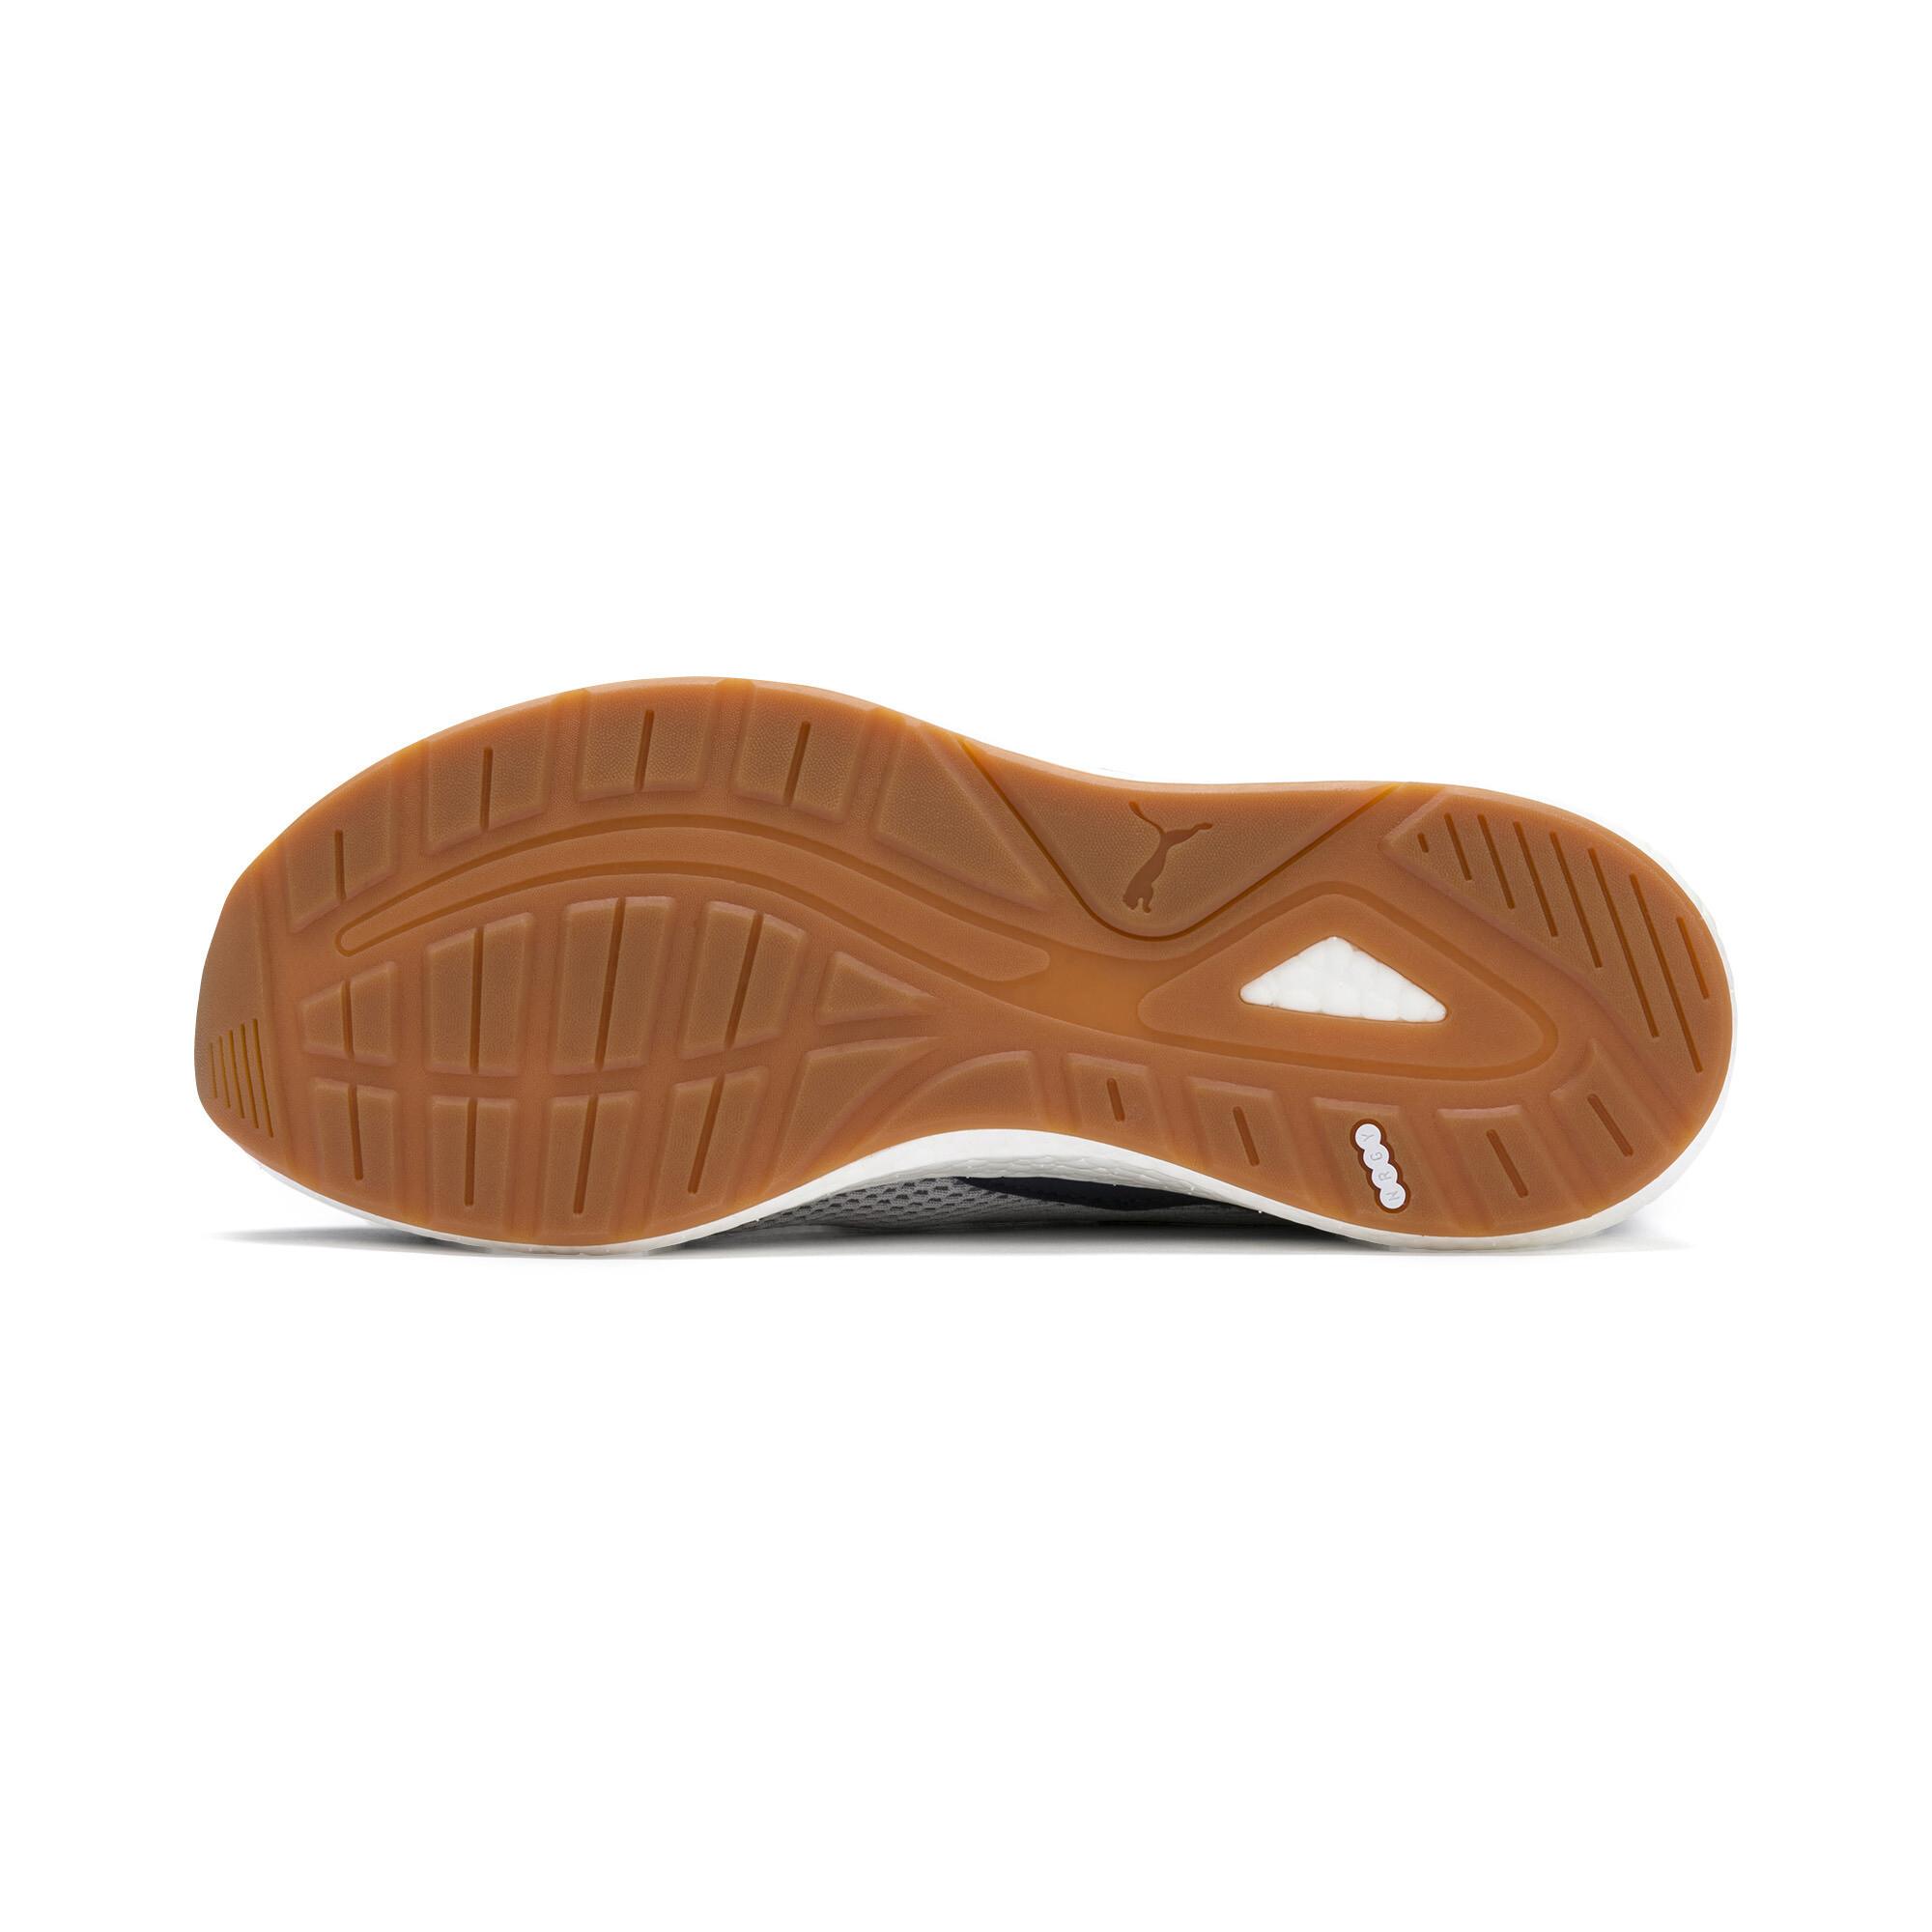 PUMA-NRGY-Neko-Skim-Men-s-Running-Shoes-Men-Shoe-Running thumbnail 16